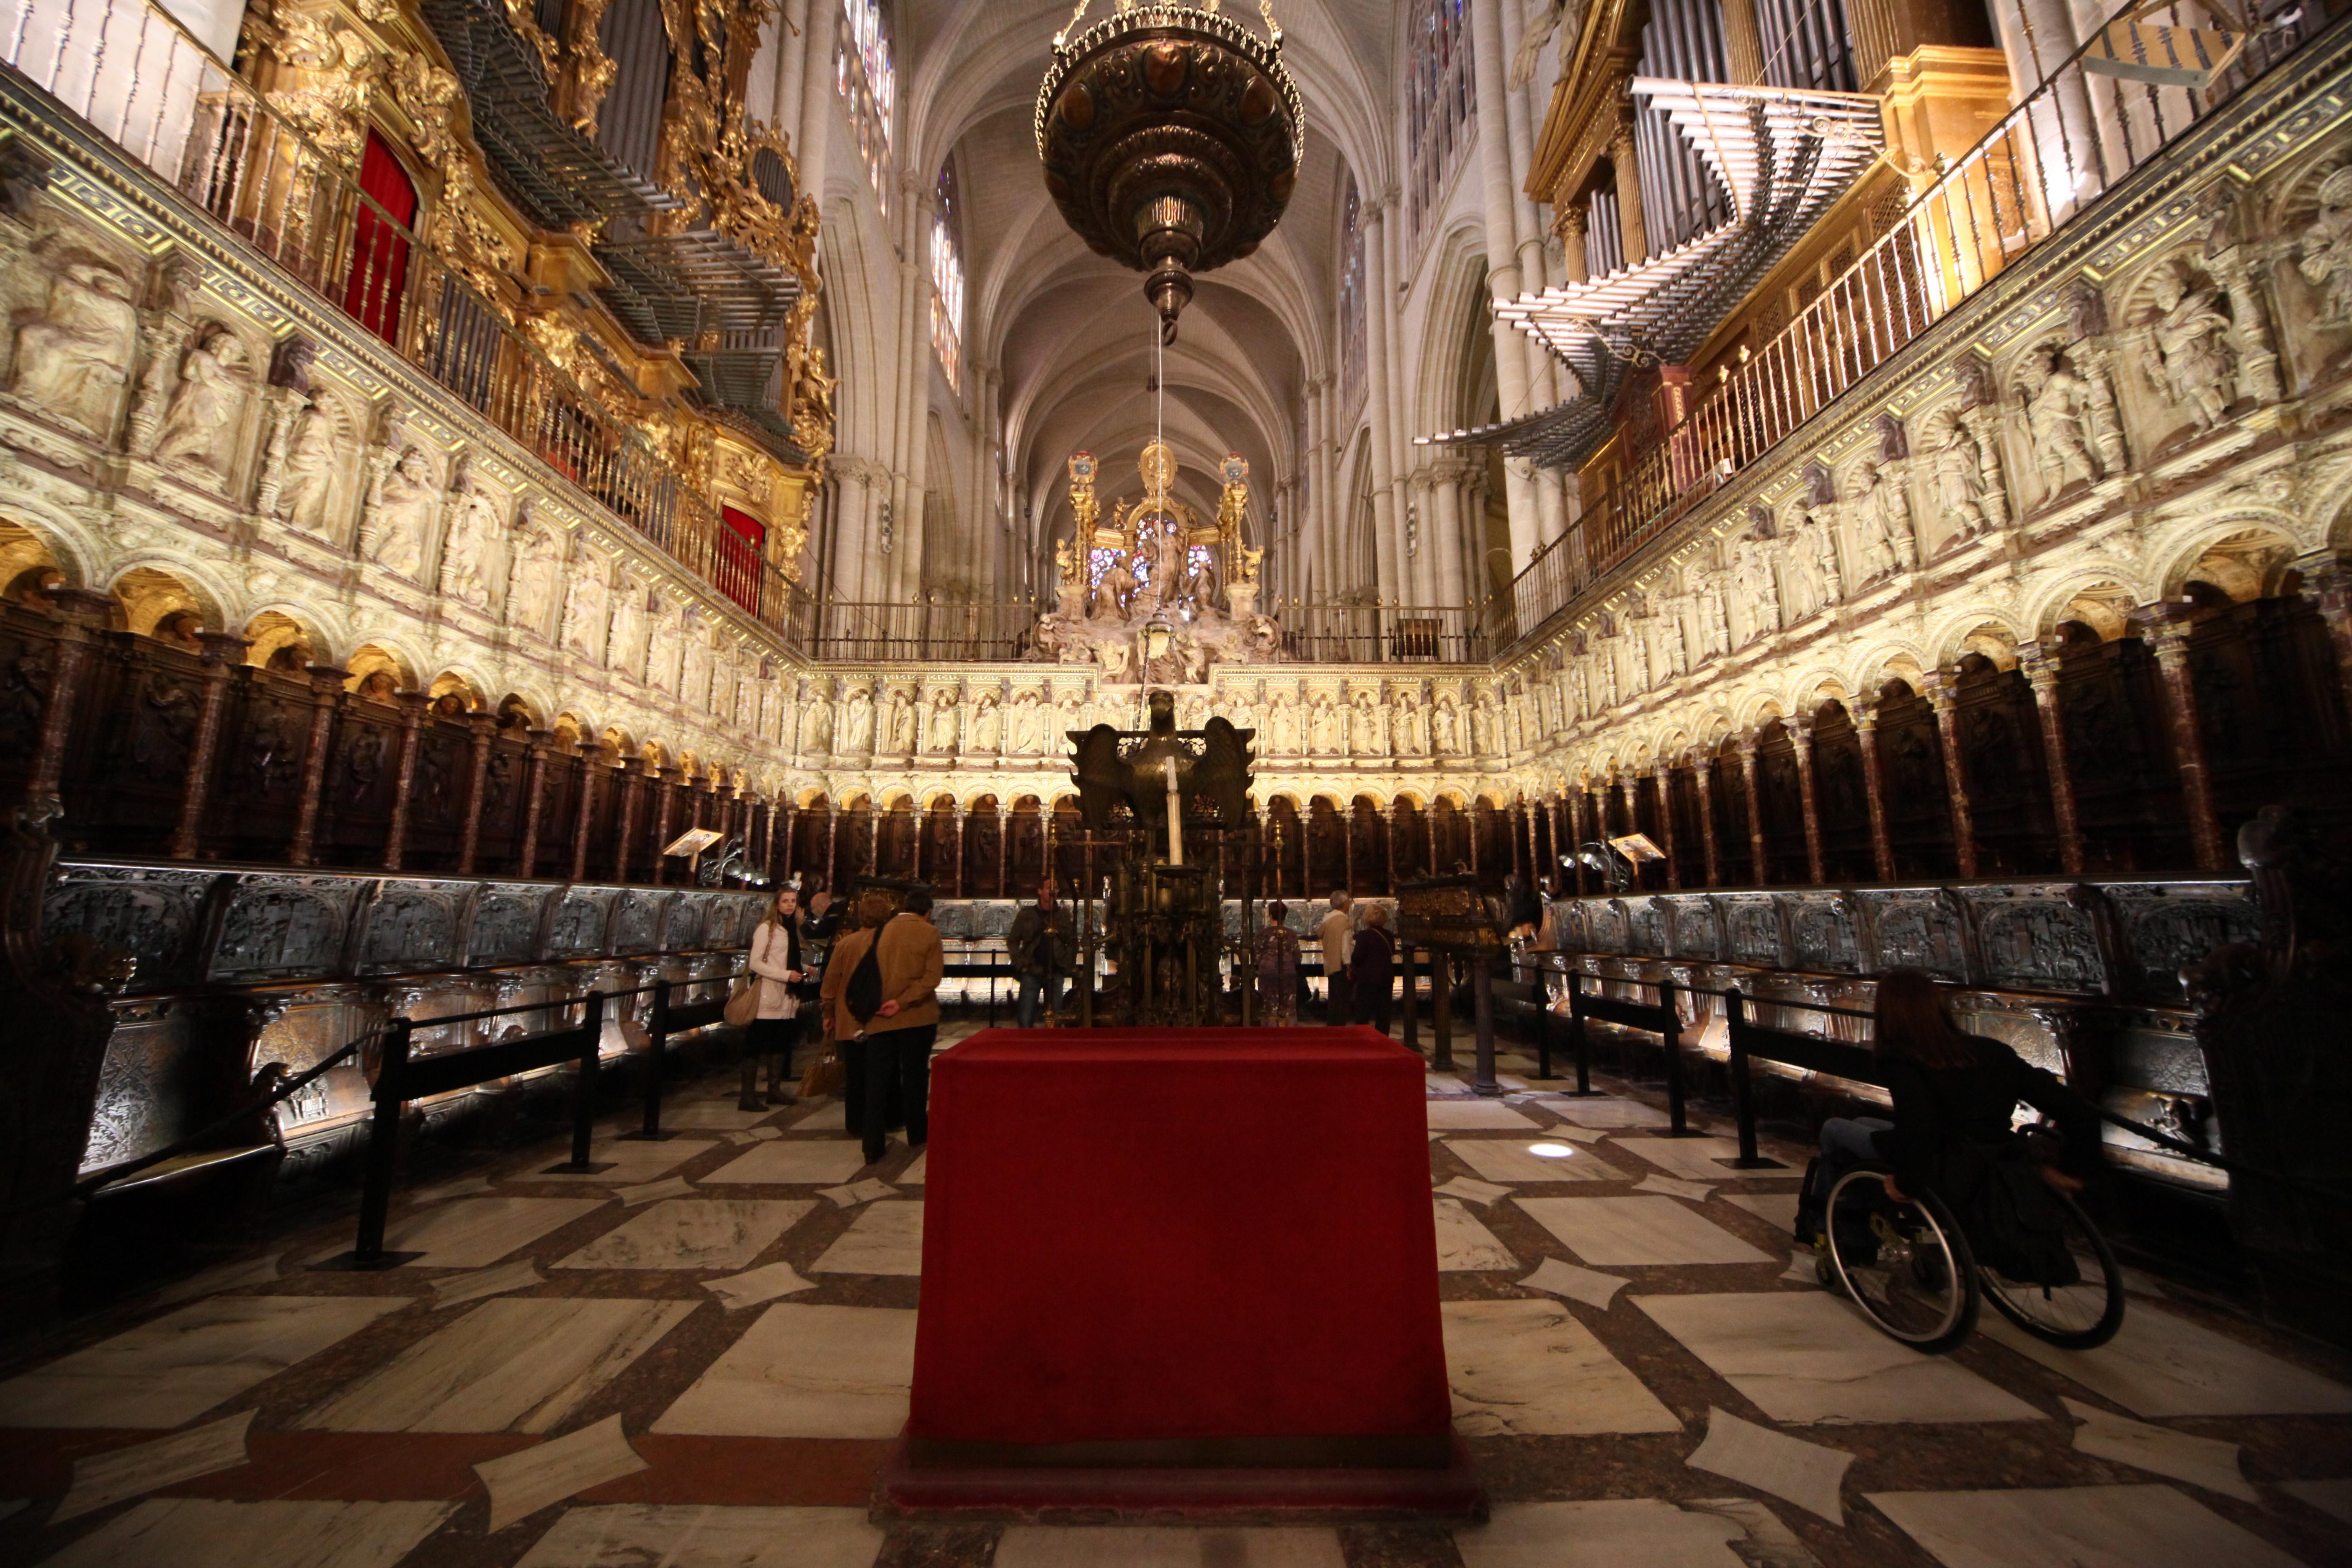 Coro De La Catedral De Toledo Wikipedia La Enciclopedia Libre